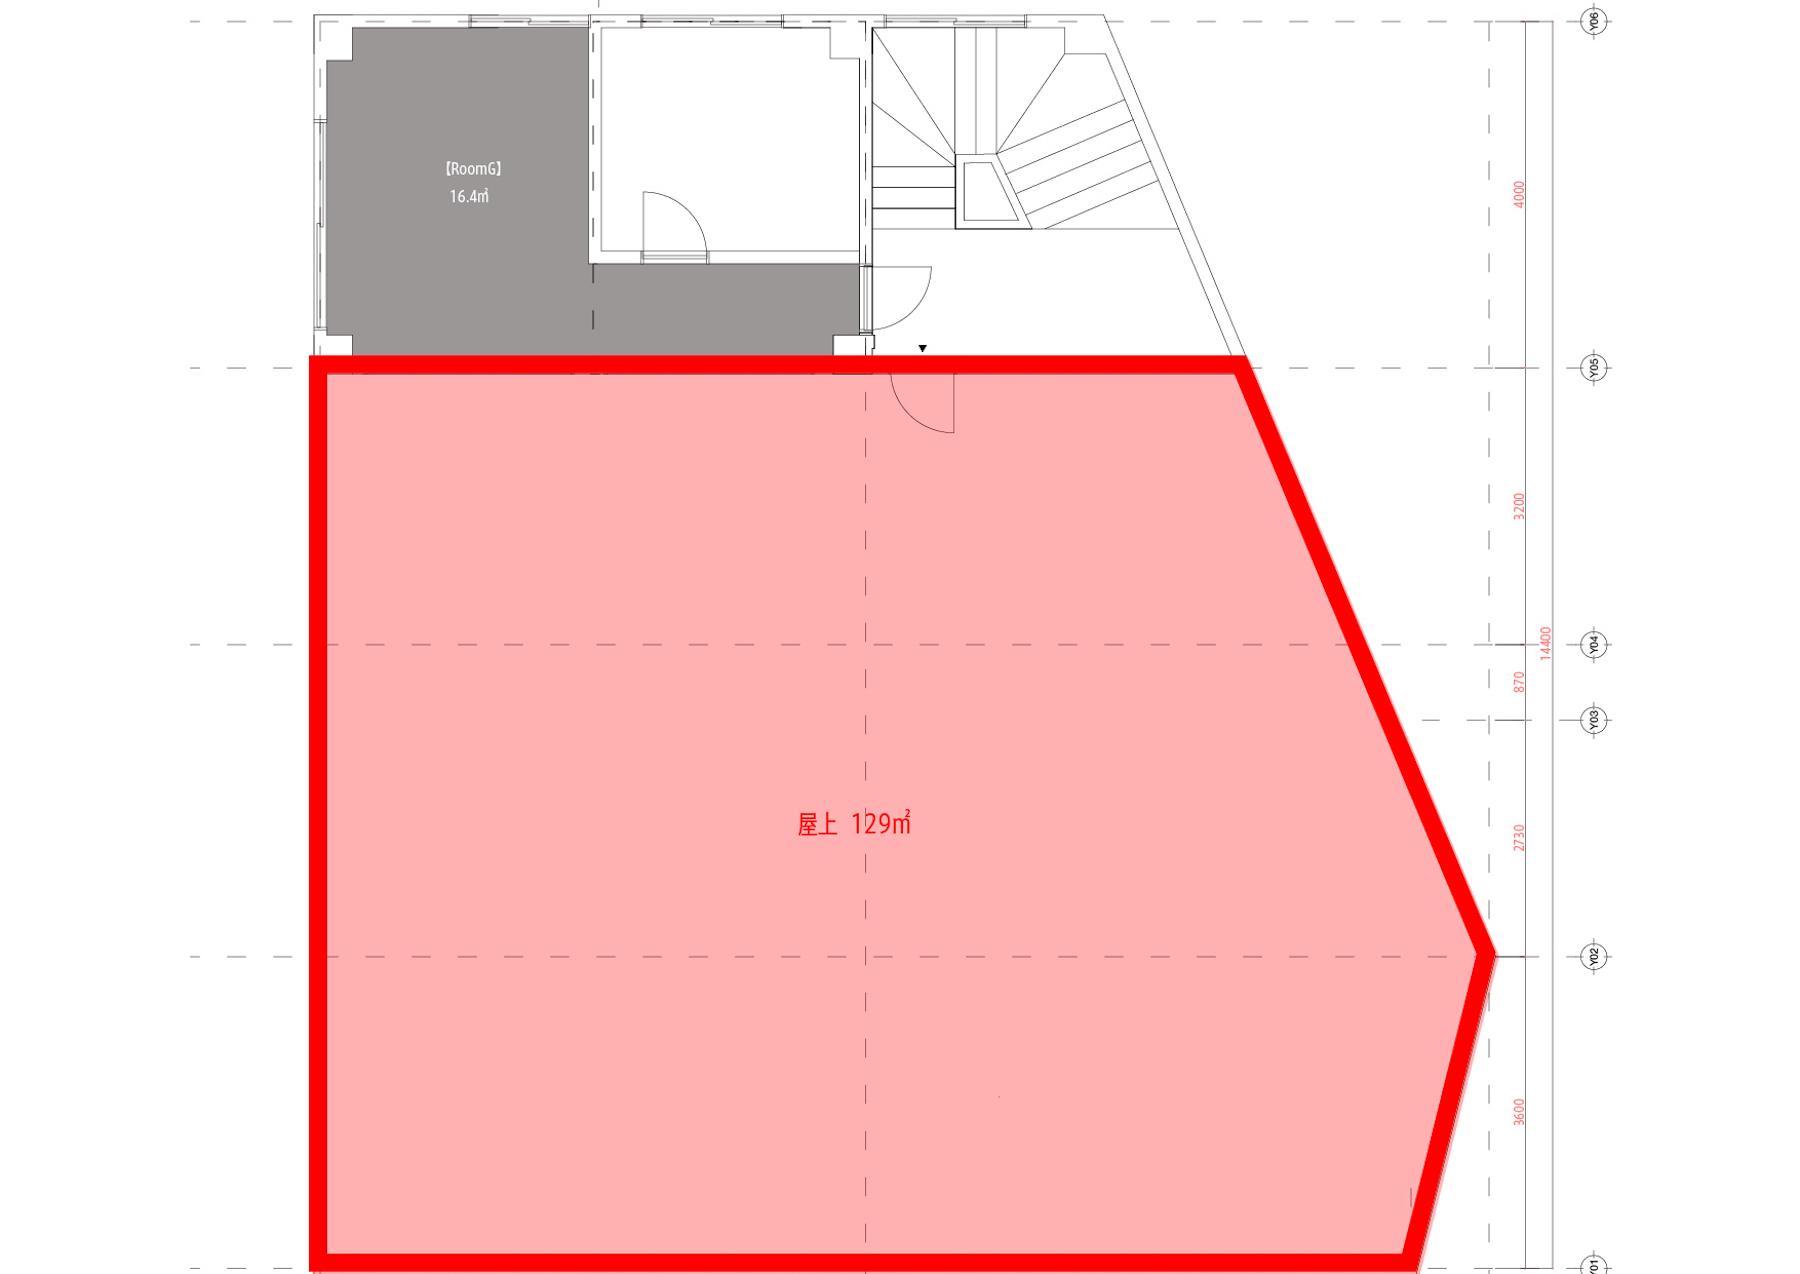 横浜BLDG店 -ROOFTOP-平面図